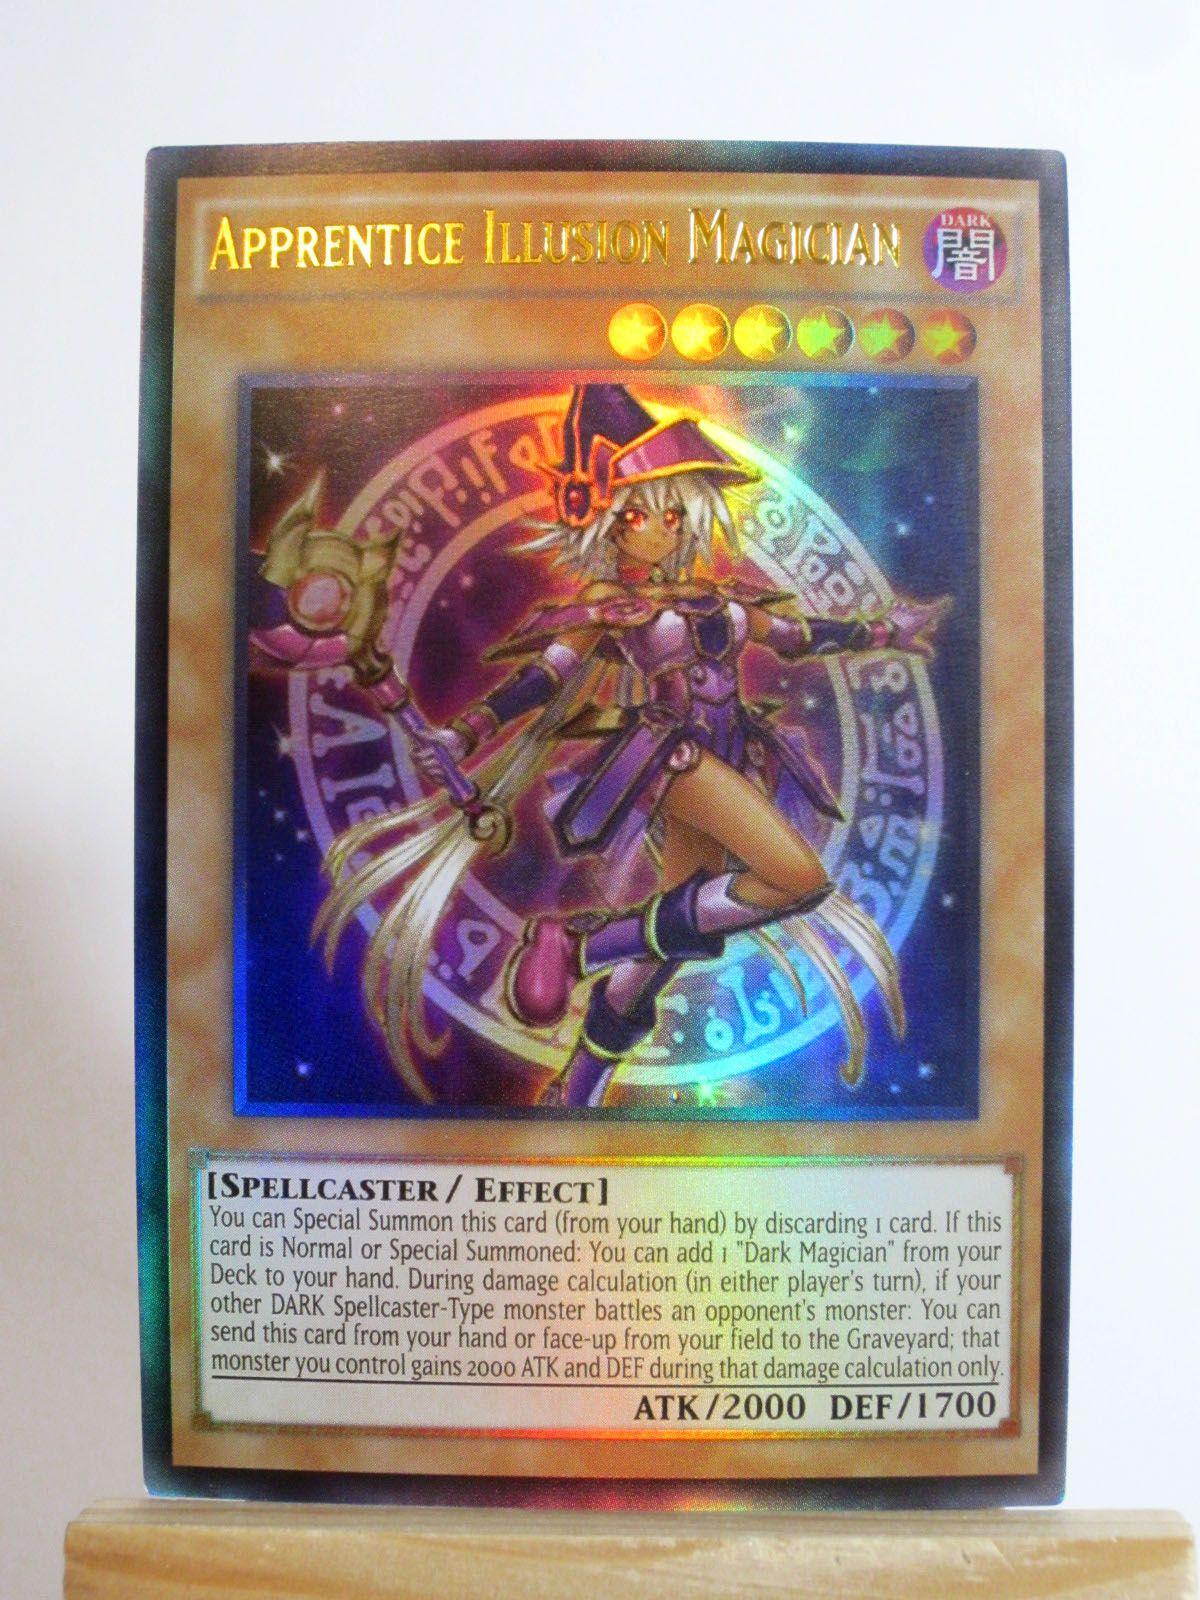 Apprentice illusion magician art 1 dark magician cards